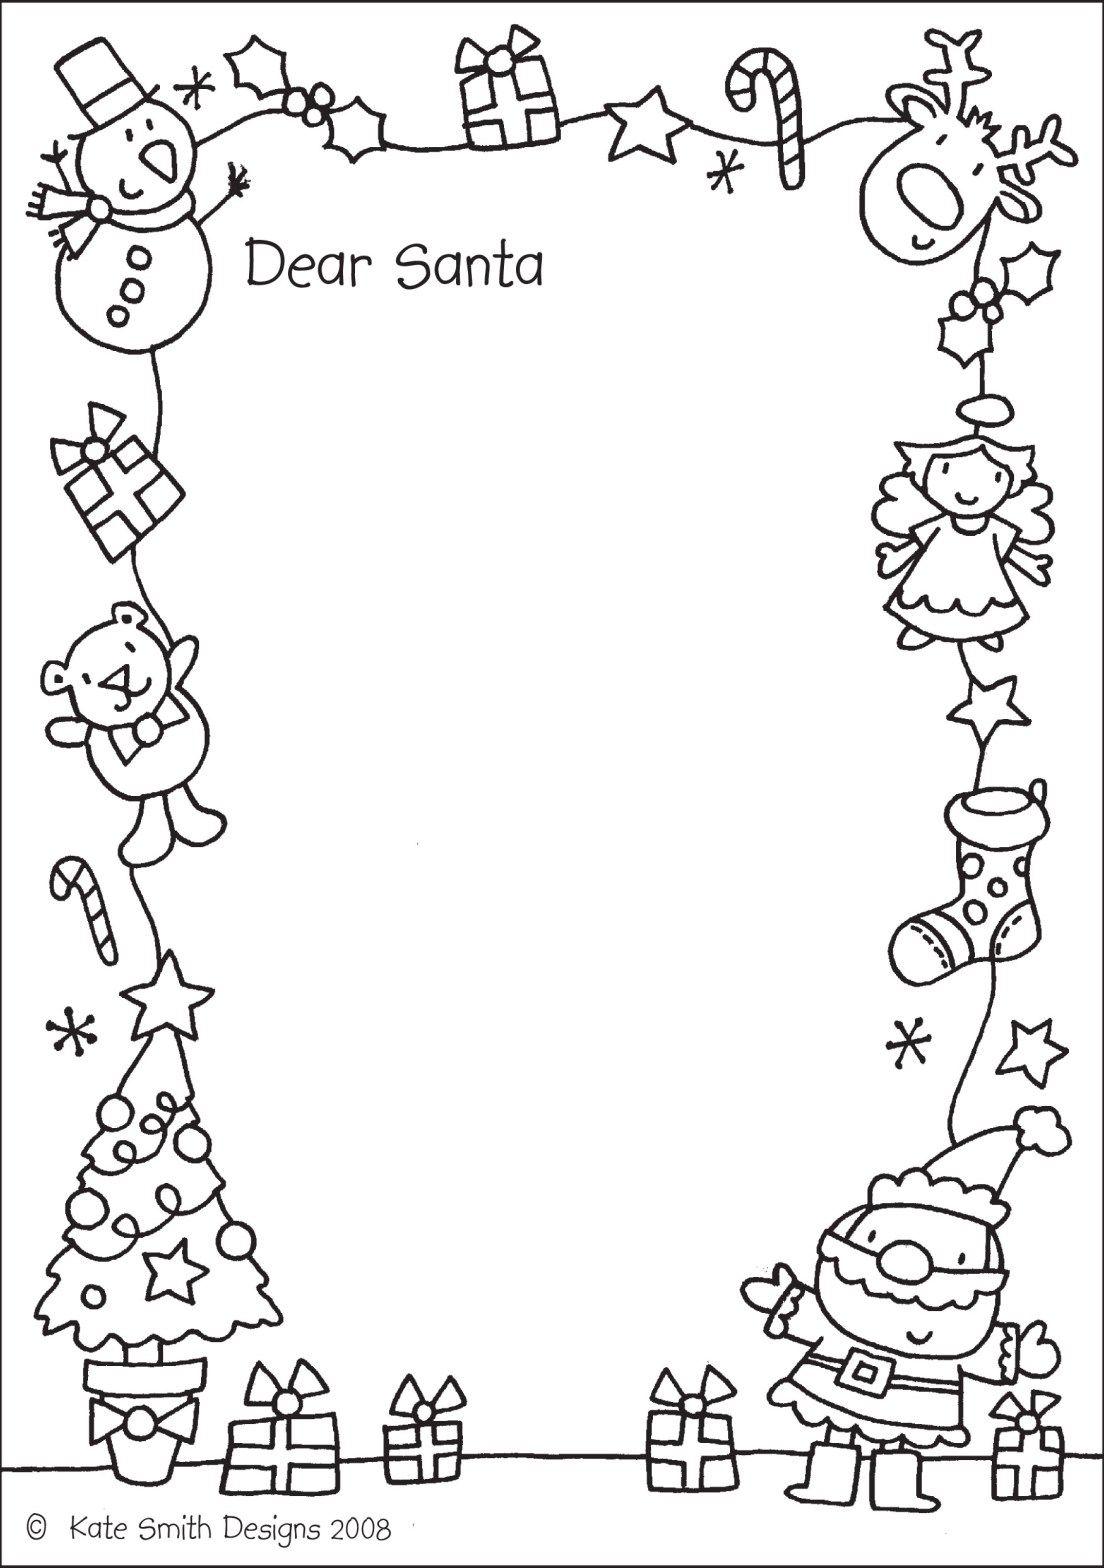 Santa Letters 10 Free Printable Letters To Santa Letters From Santa Blog Christmas Lettering Santa Letter Template Christmas Freebie